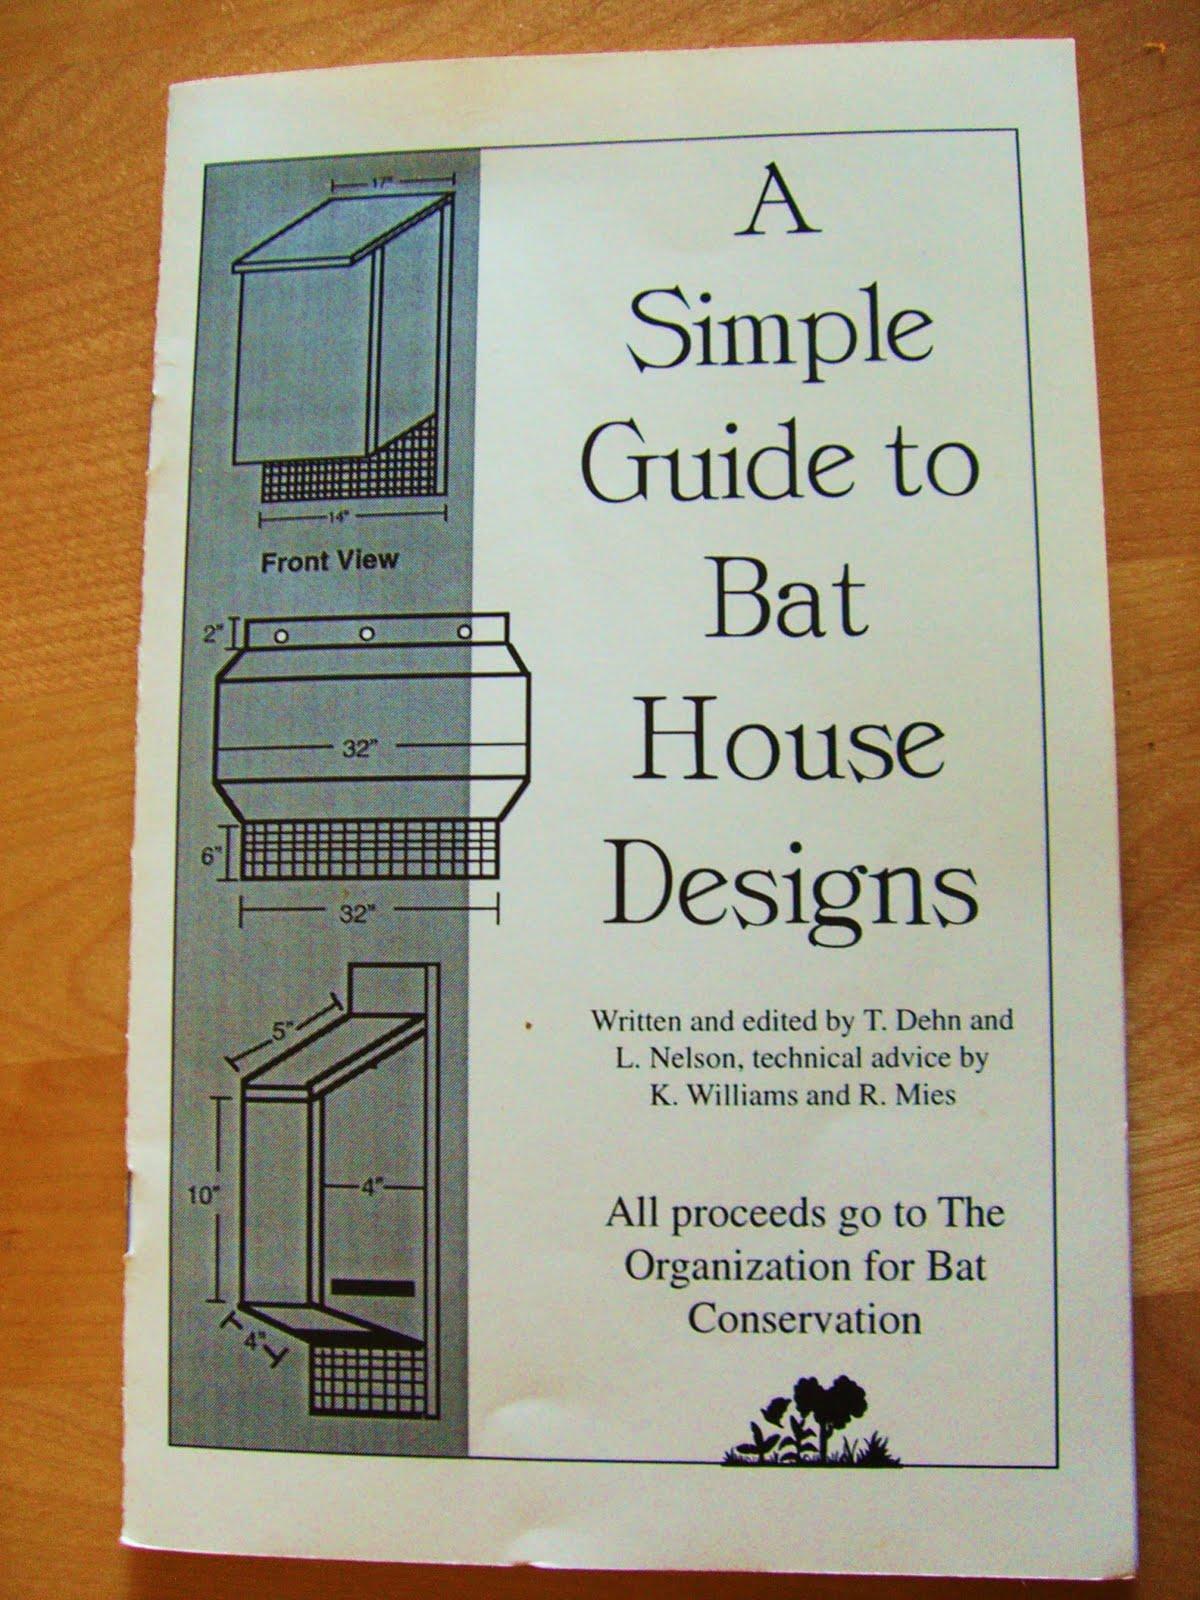 plans for bat houses pictures - 3d house designs - veerle